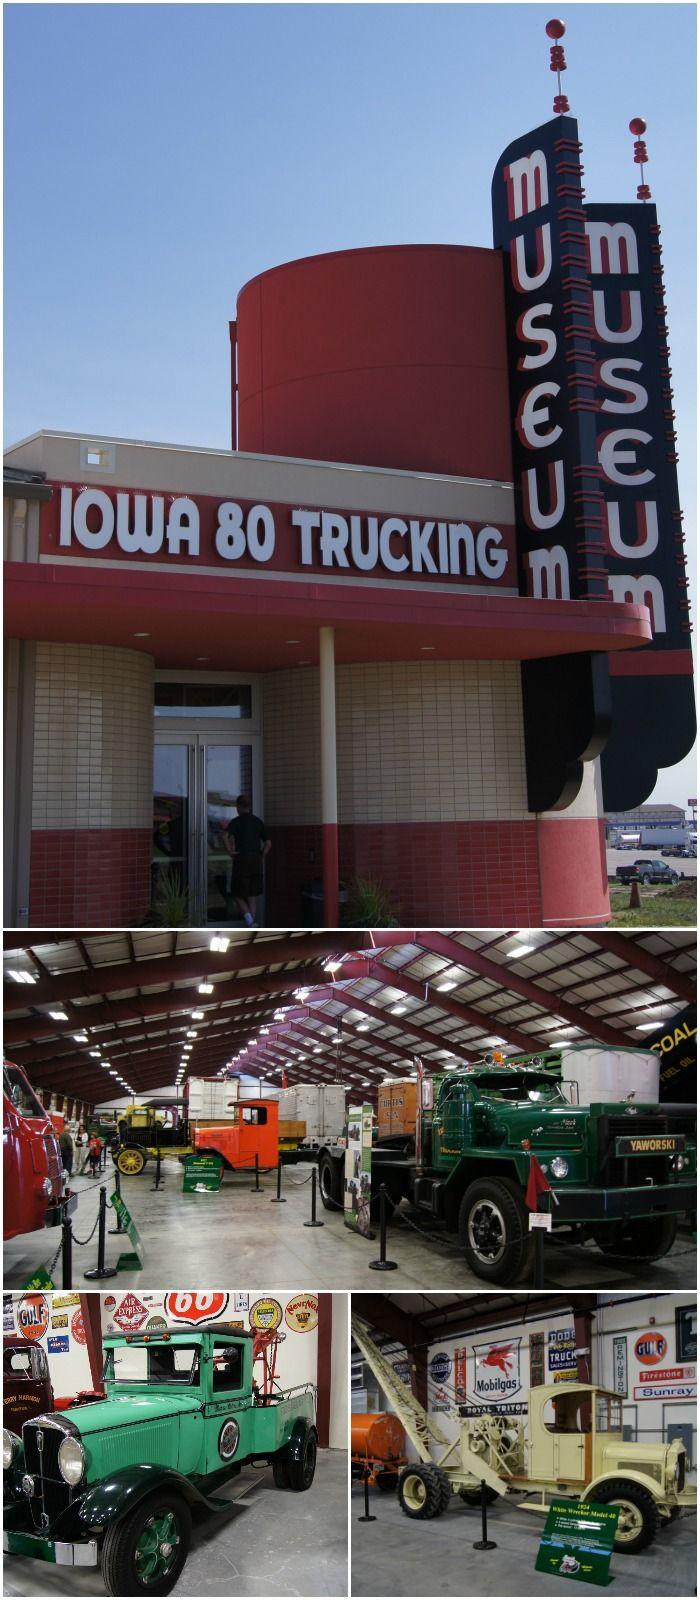 iowa 80 trucking museum walcott iowa usa labeled the most